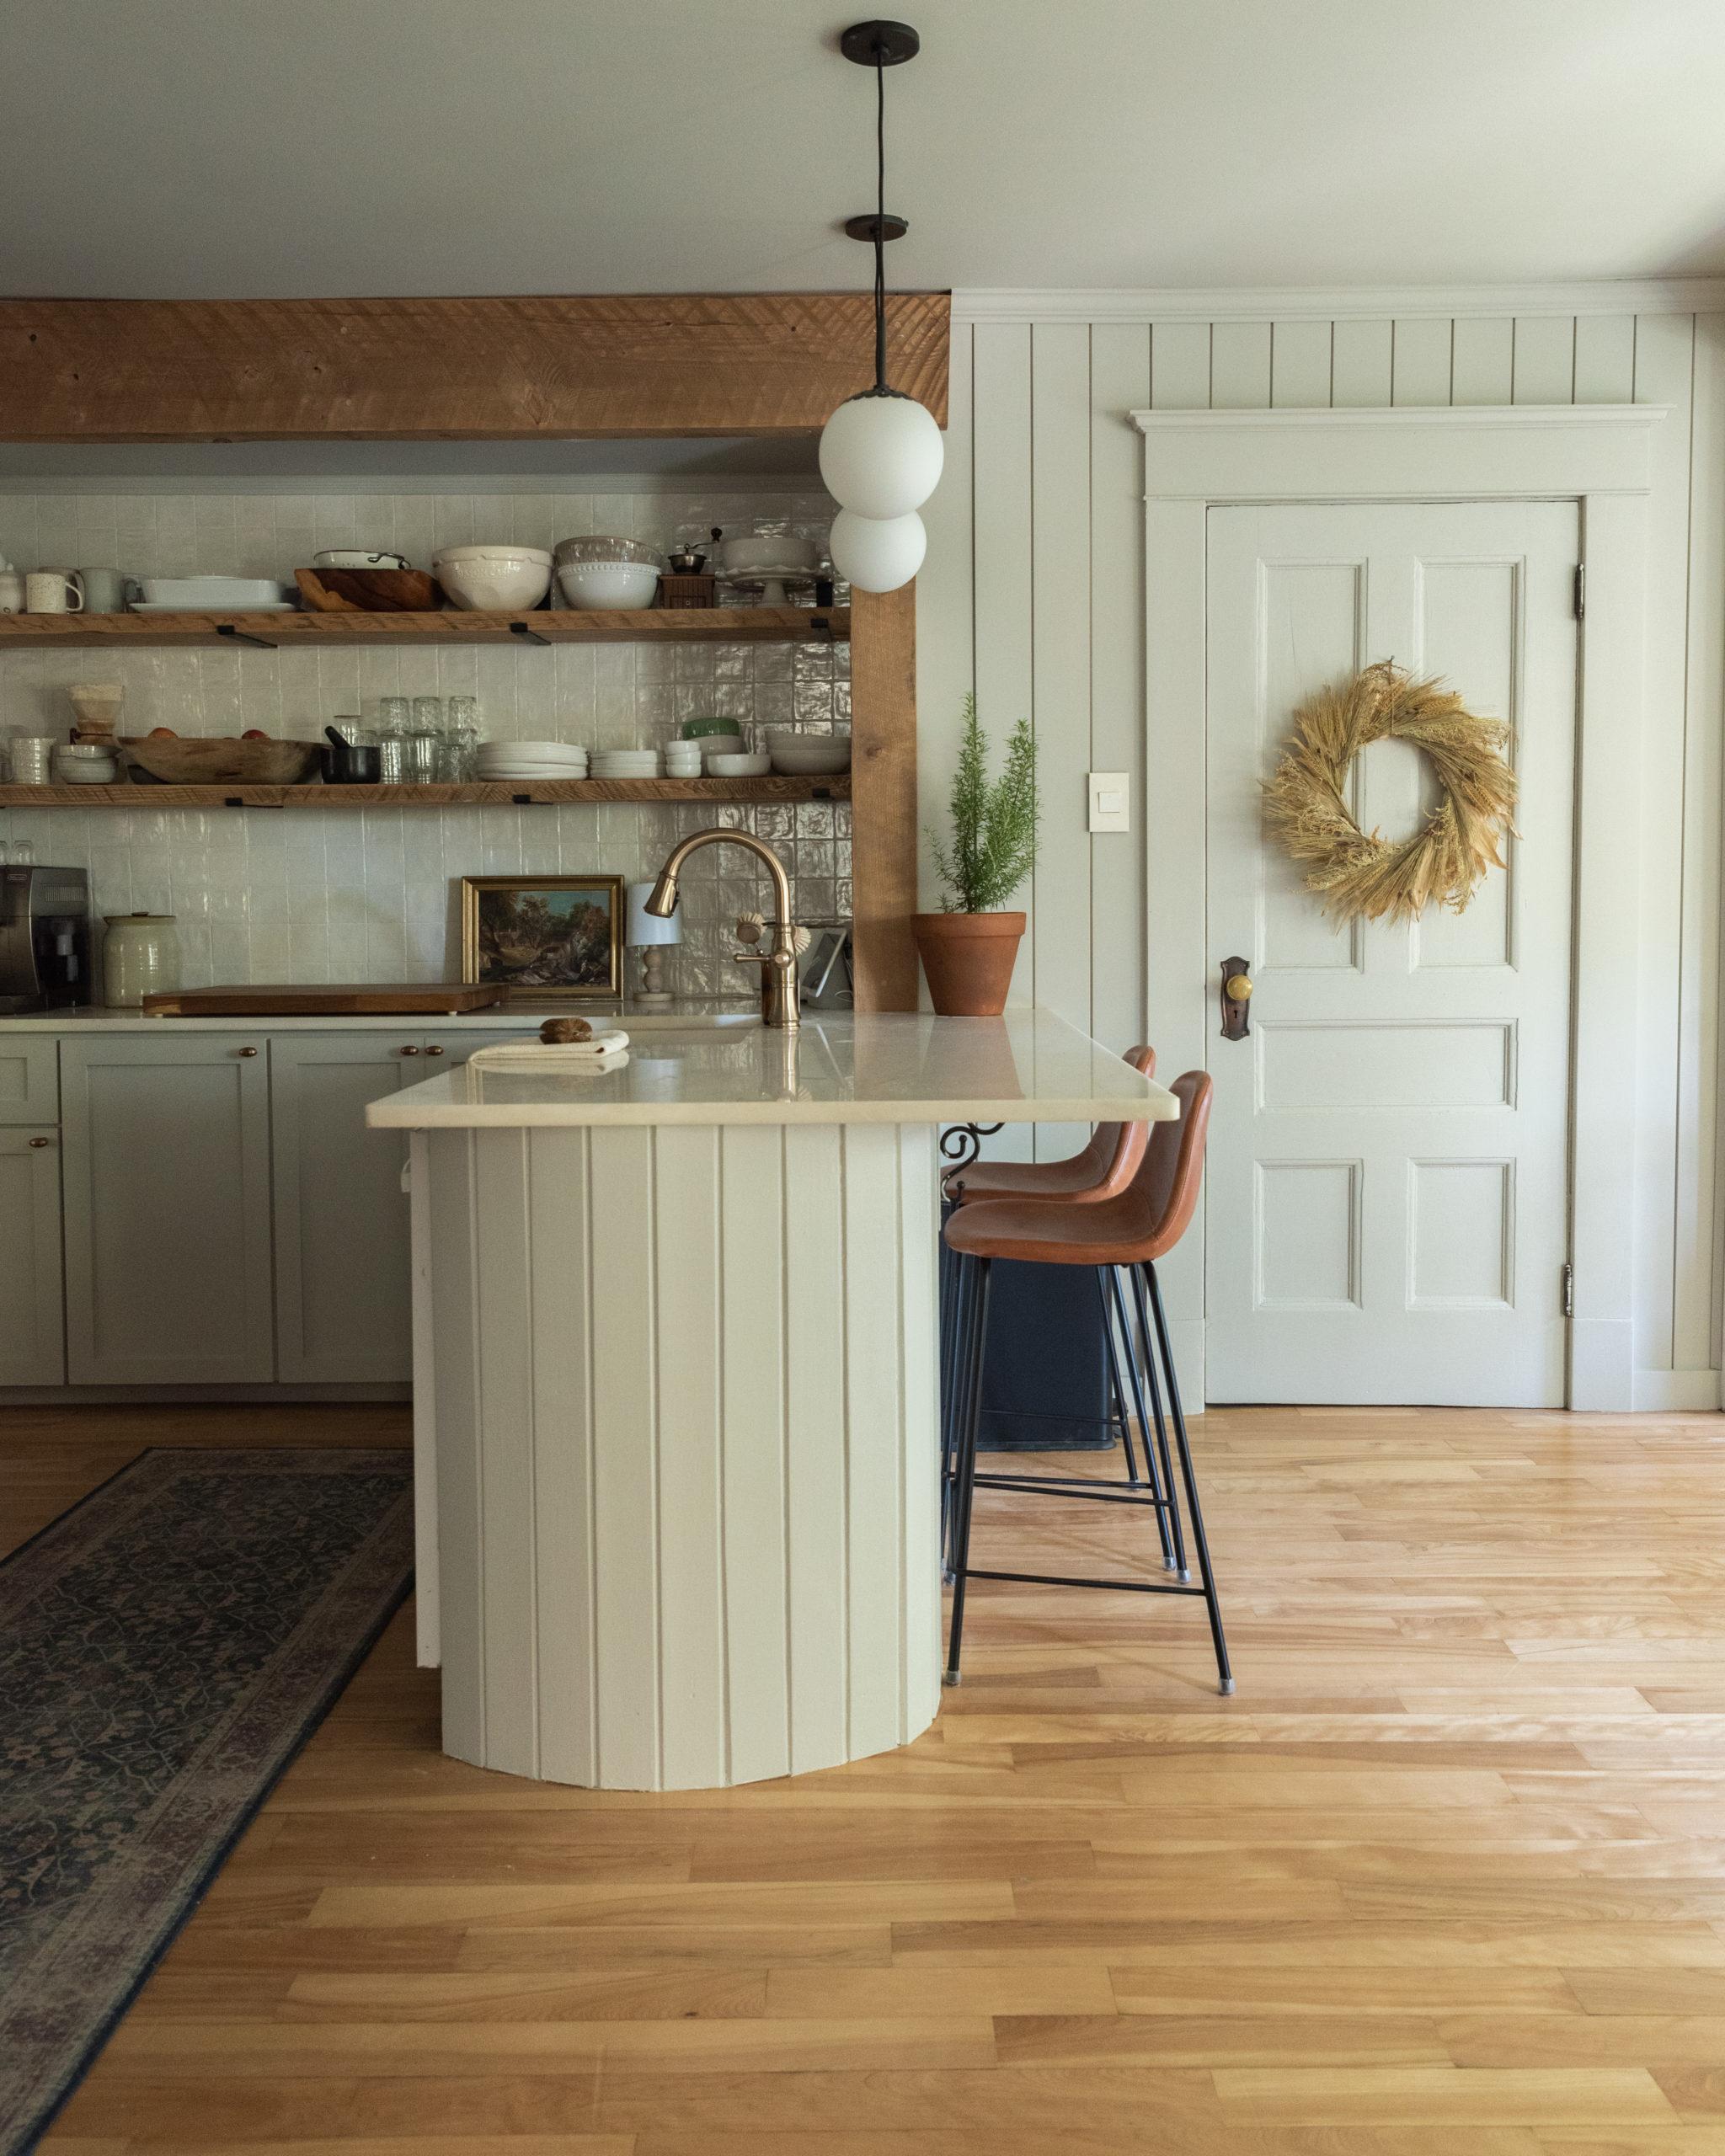 The Wild Decoelis   Our Kitchen Renovation Reveal